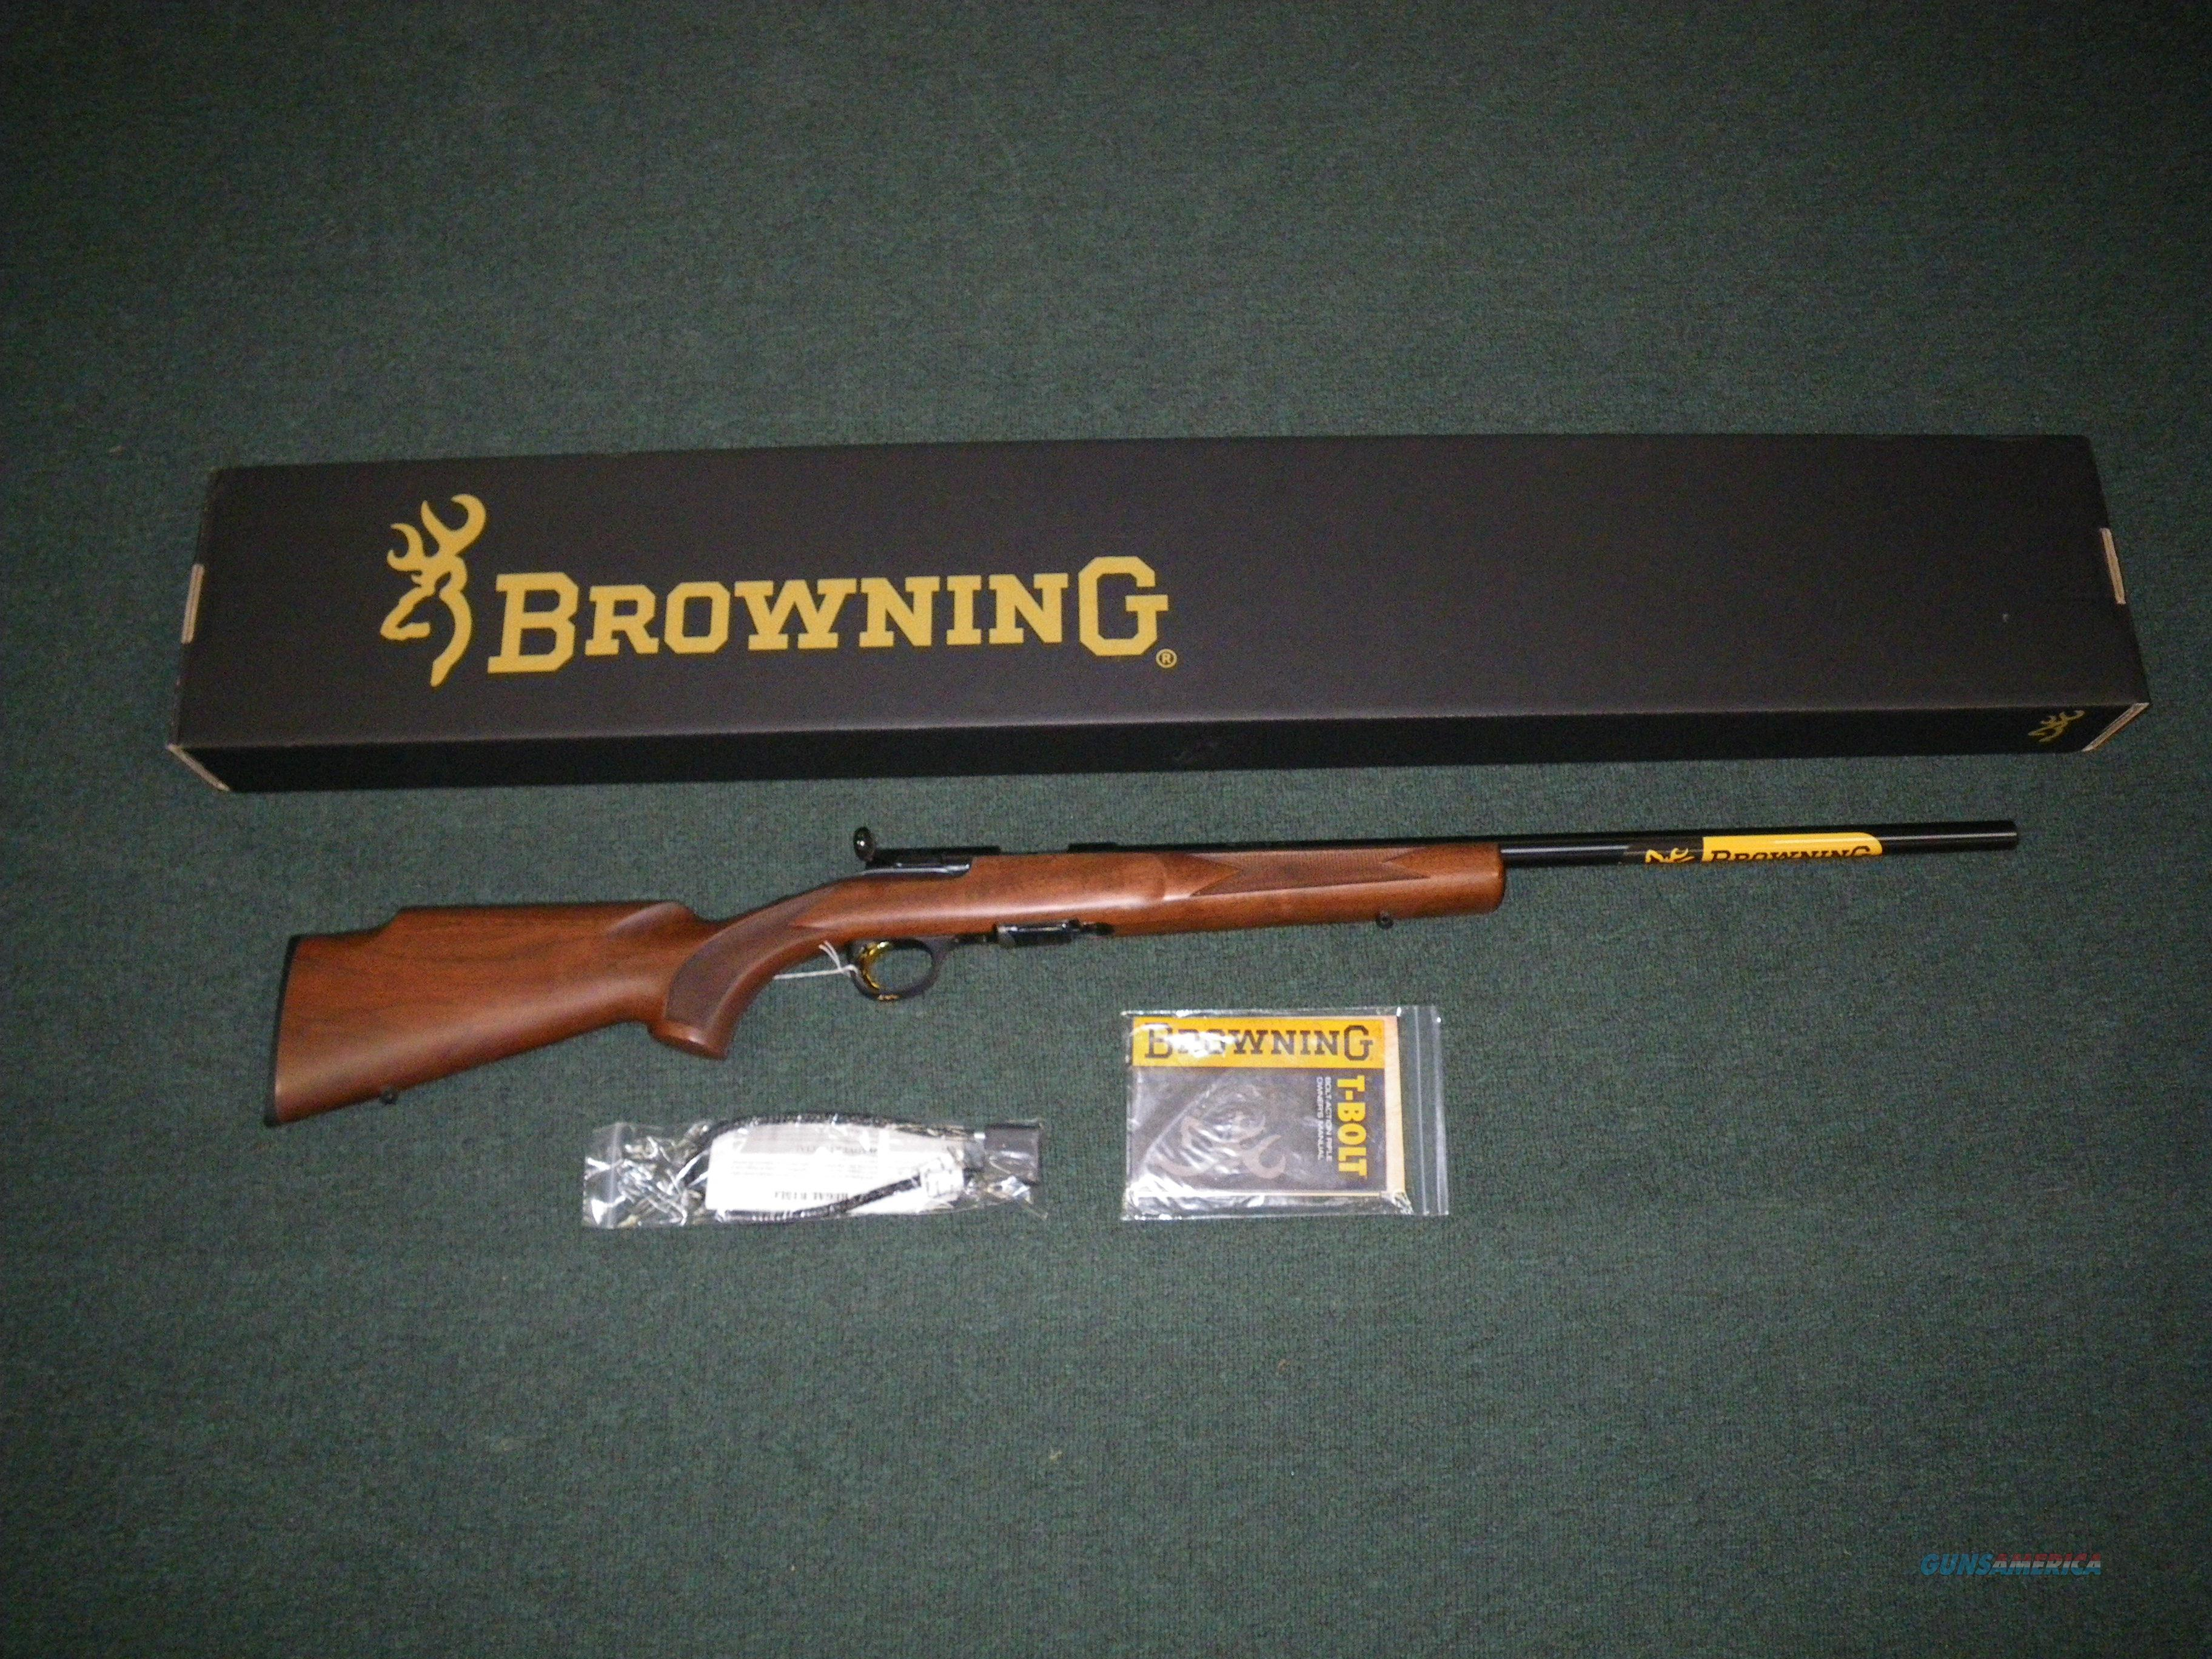 "Browning T-Bolt Target/Varmint Wood 17 HMR 22"" #025176270  Guns > Rifles > Browning Rifles > Bolt Action > Hunting > Blue"